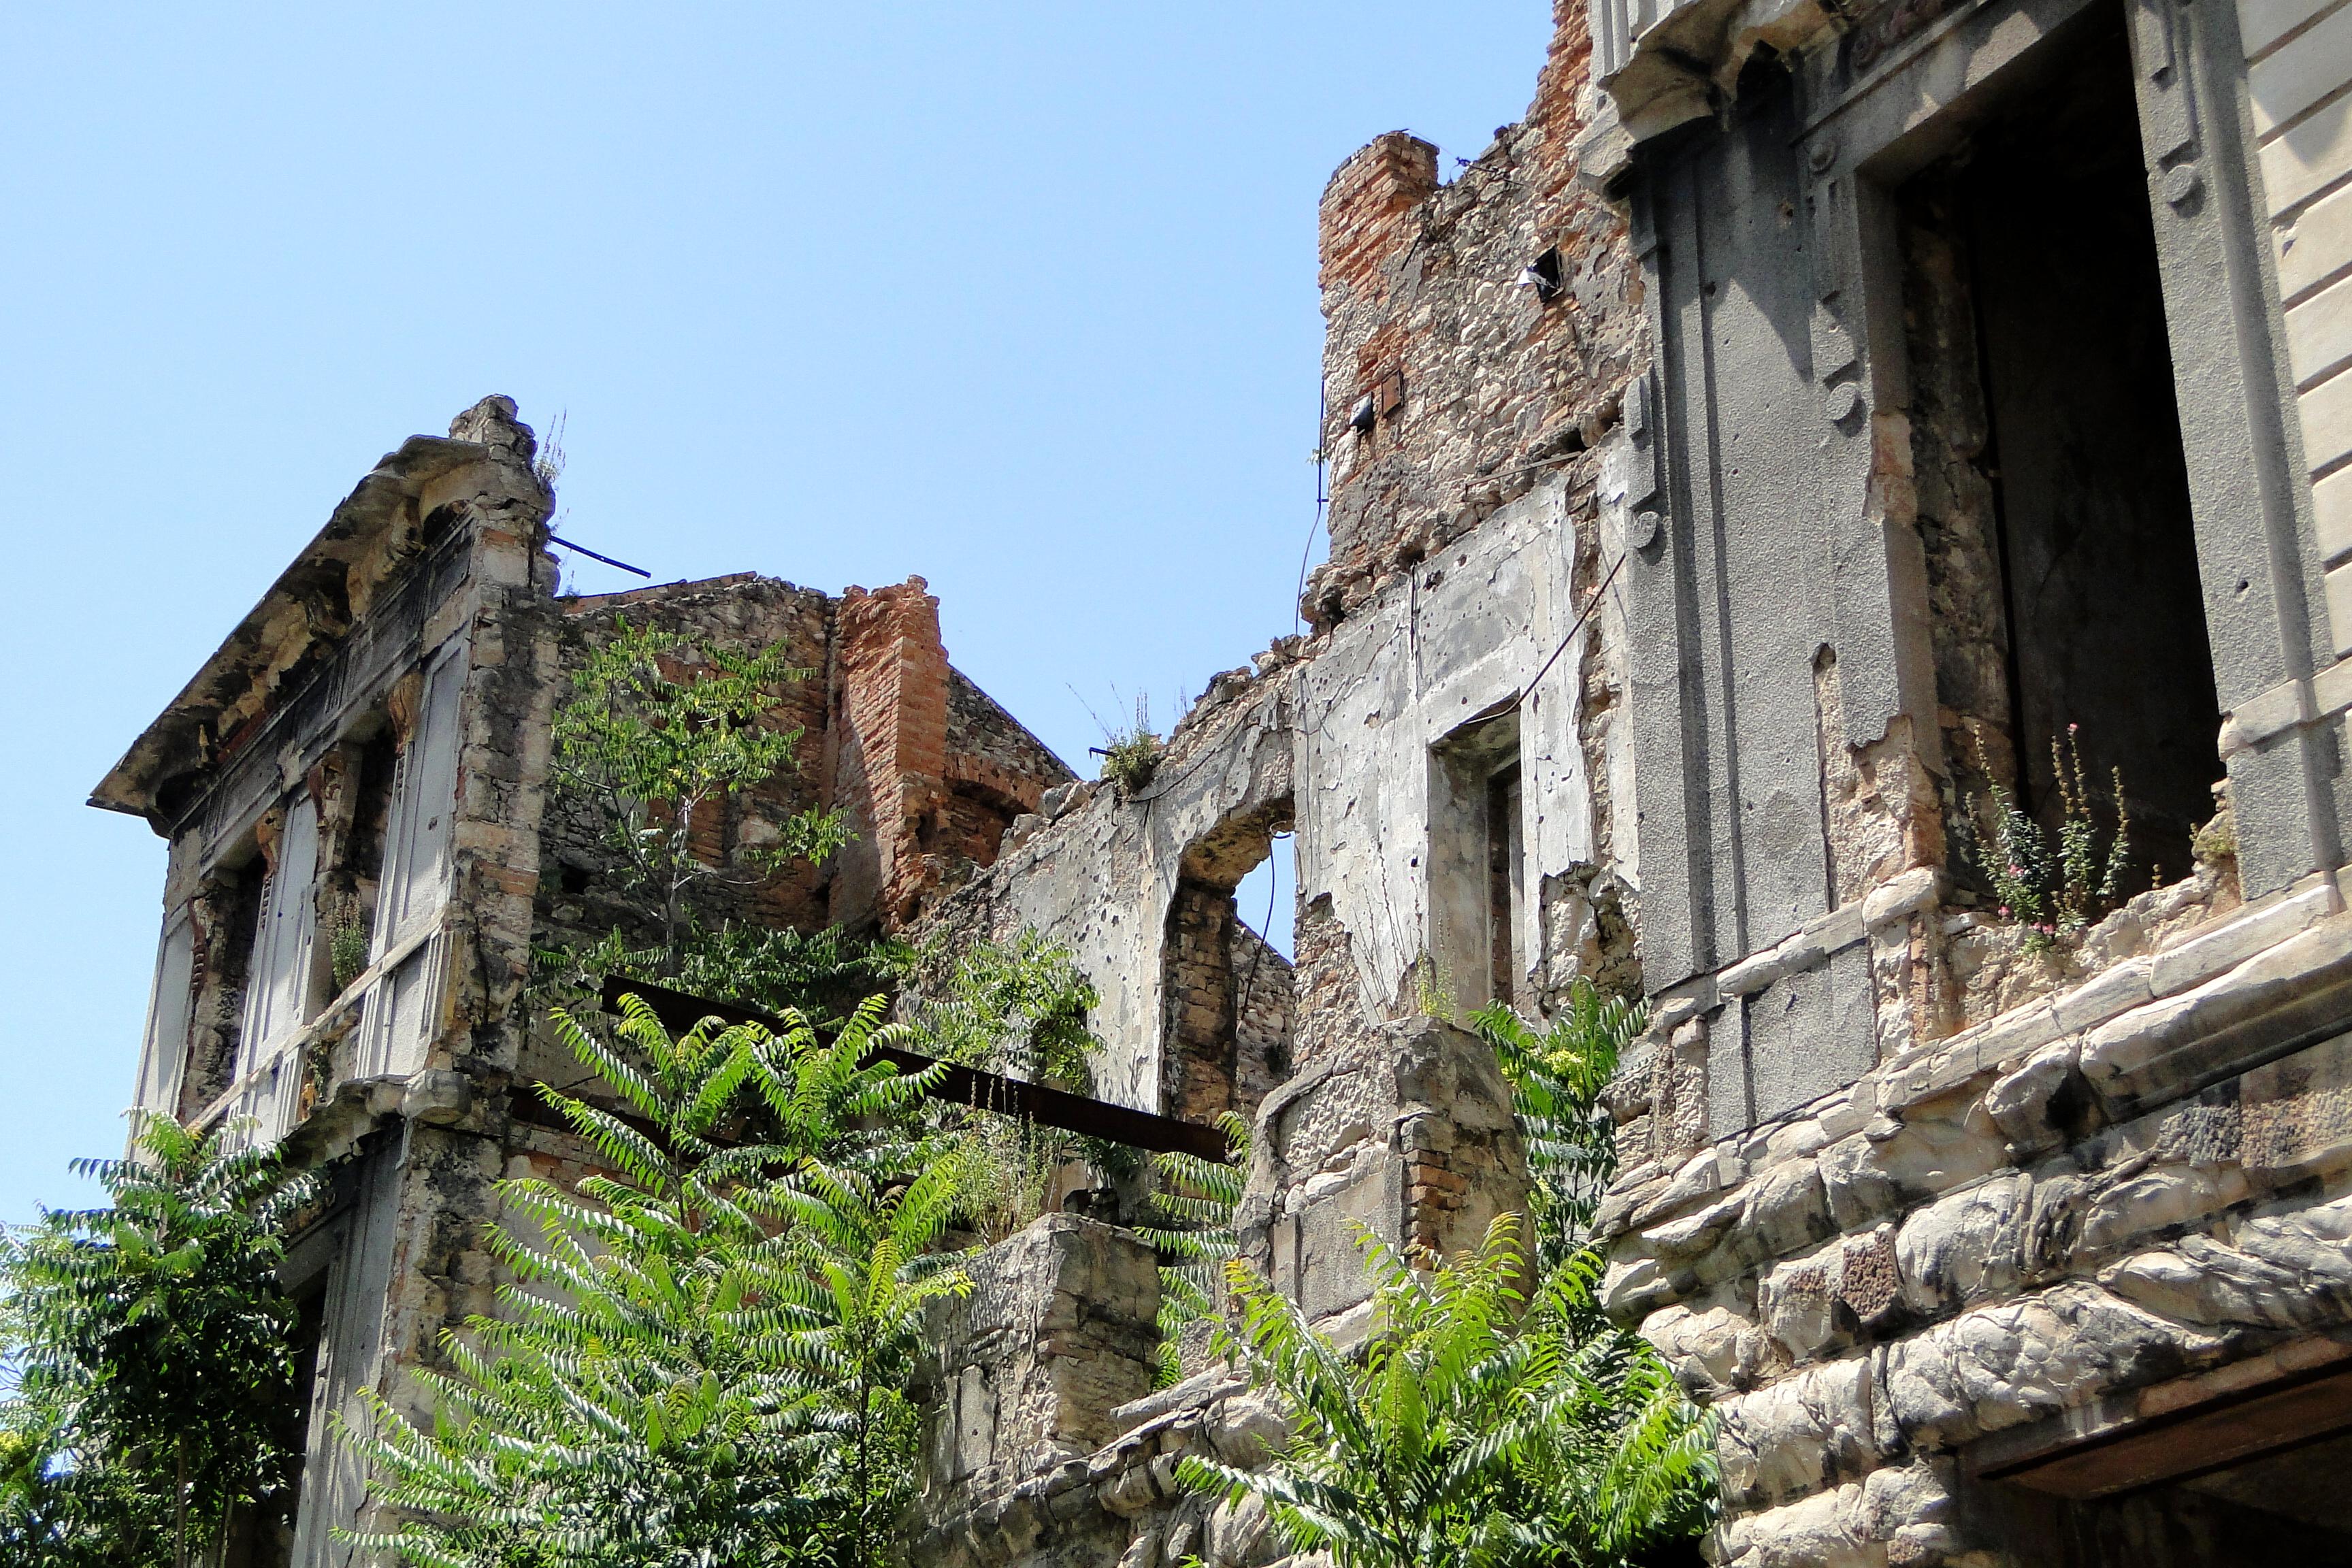 Filename: War_Ruin_-_Mostar_-_Bosnia_and_Herzegovina.jpg